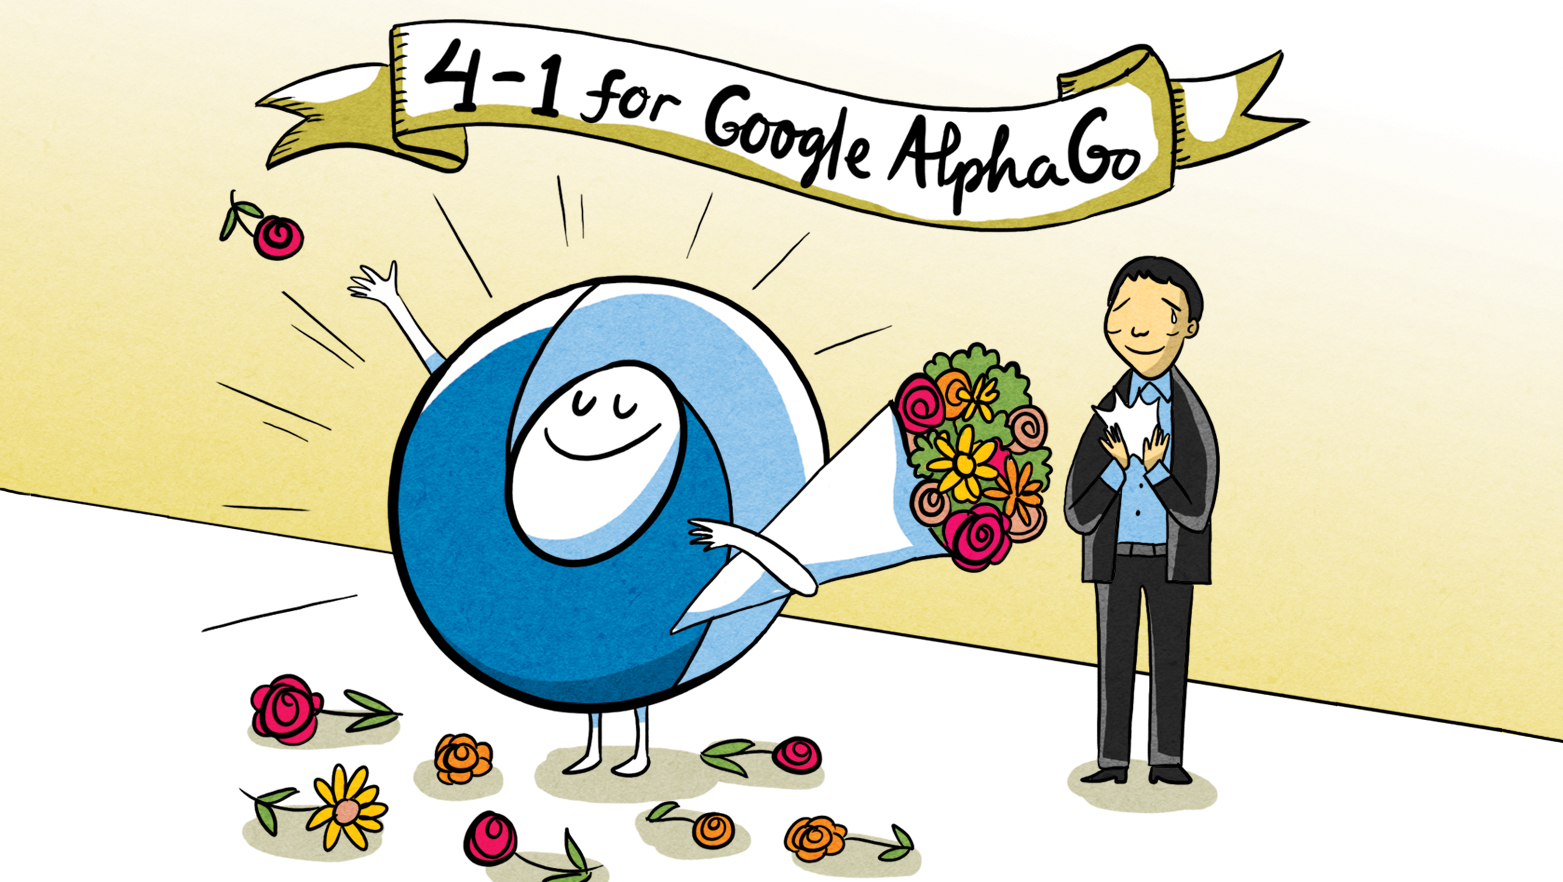 4-1 for Google Alpha Go